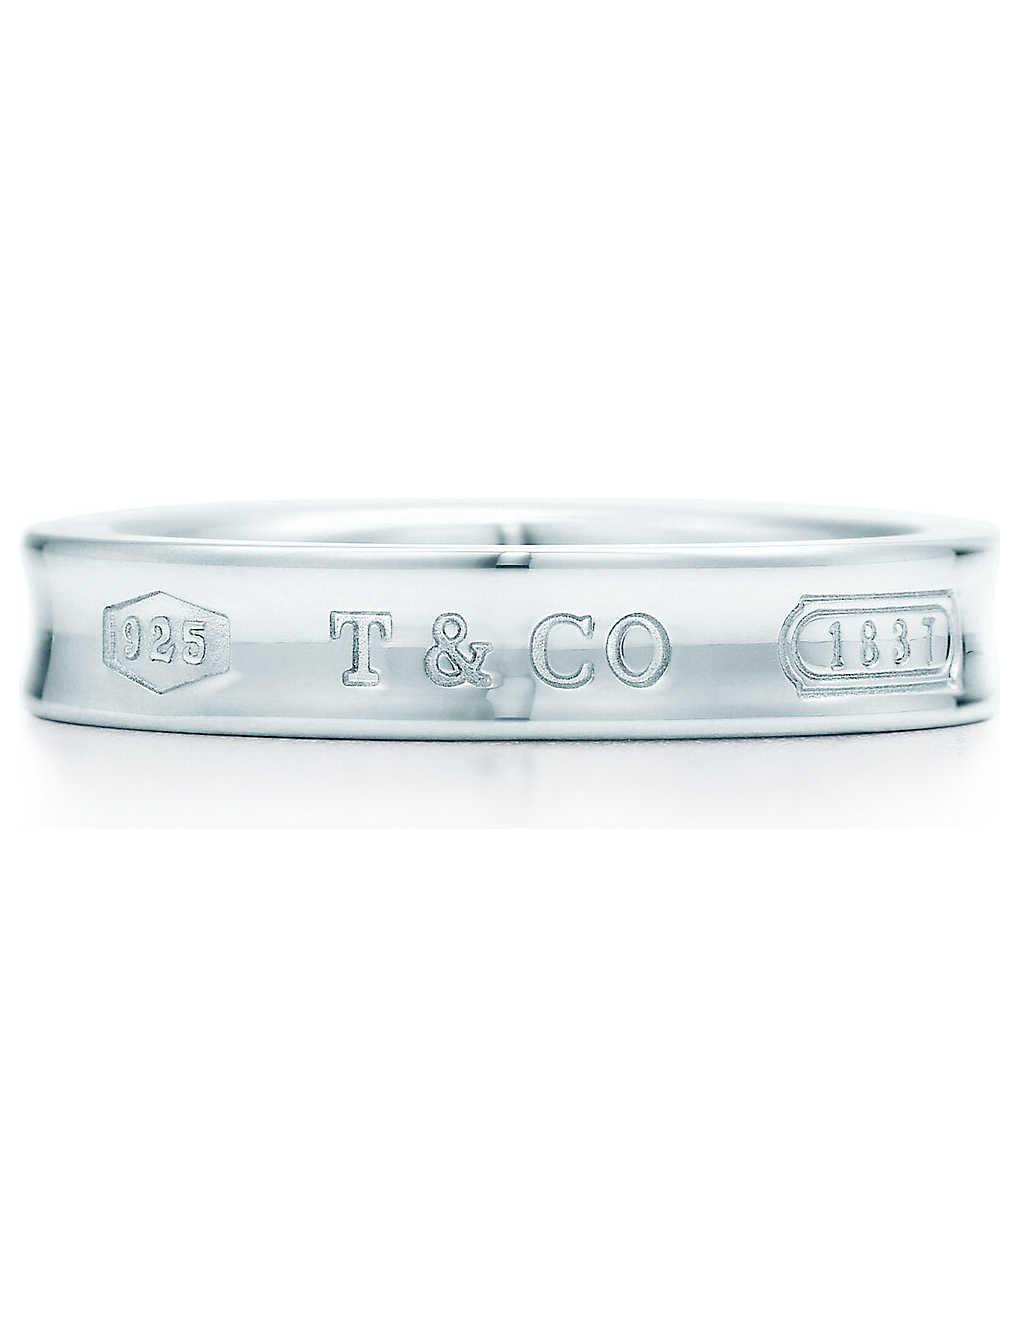 ec774cf81 TIFFANY & CO - Tiffany 1837 ring in sterling silver | Selfridges.com